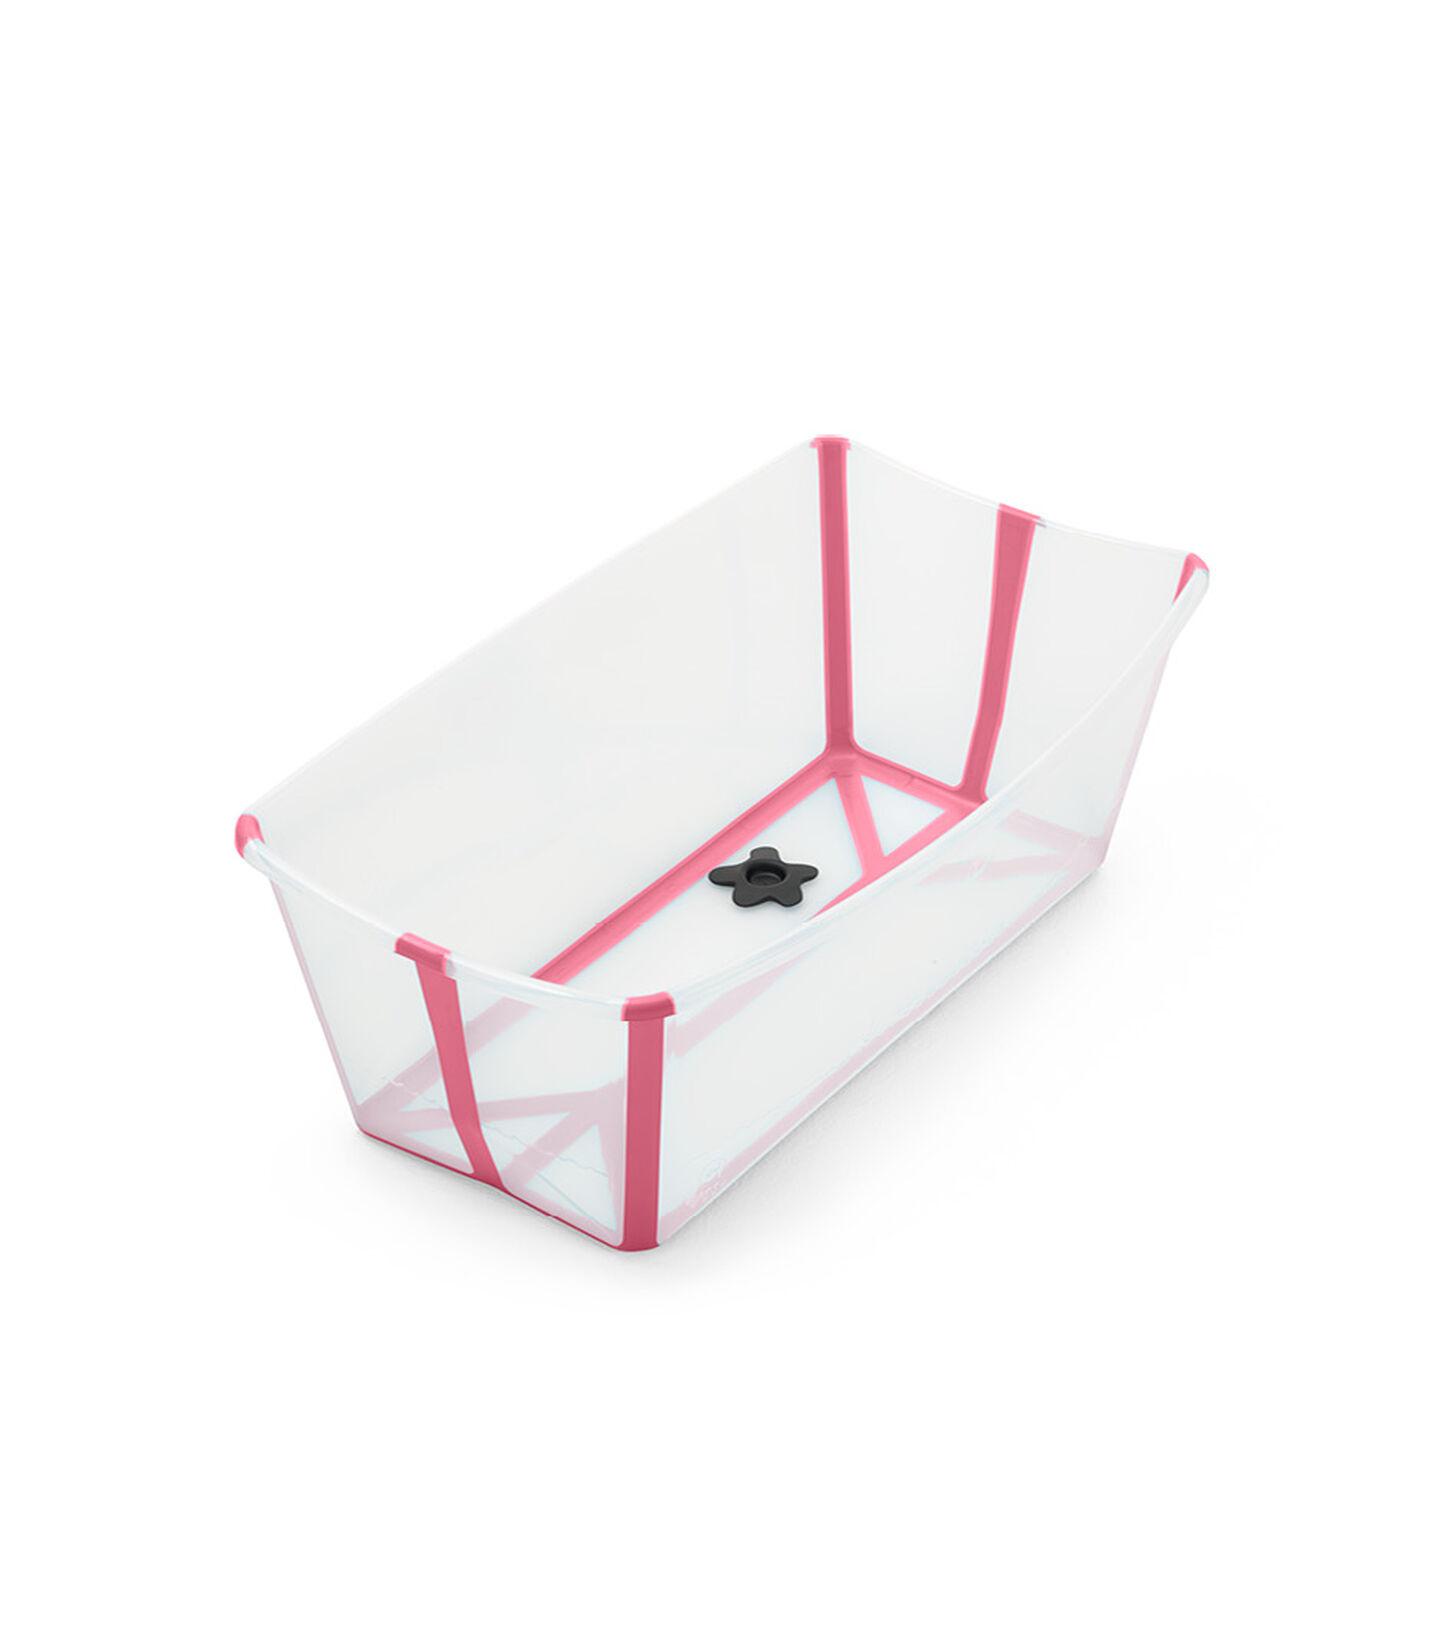 Stokke® Flexi Bath® Heat Trans Pink, Transparent Pink, mainview view 2